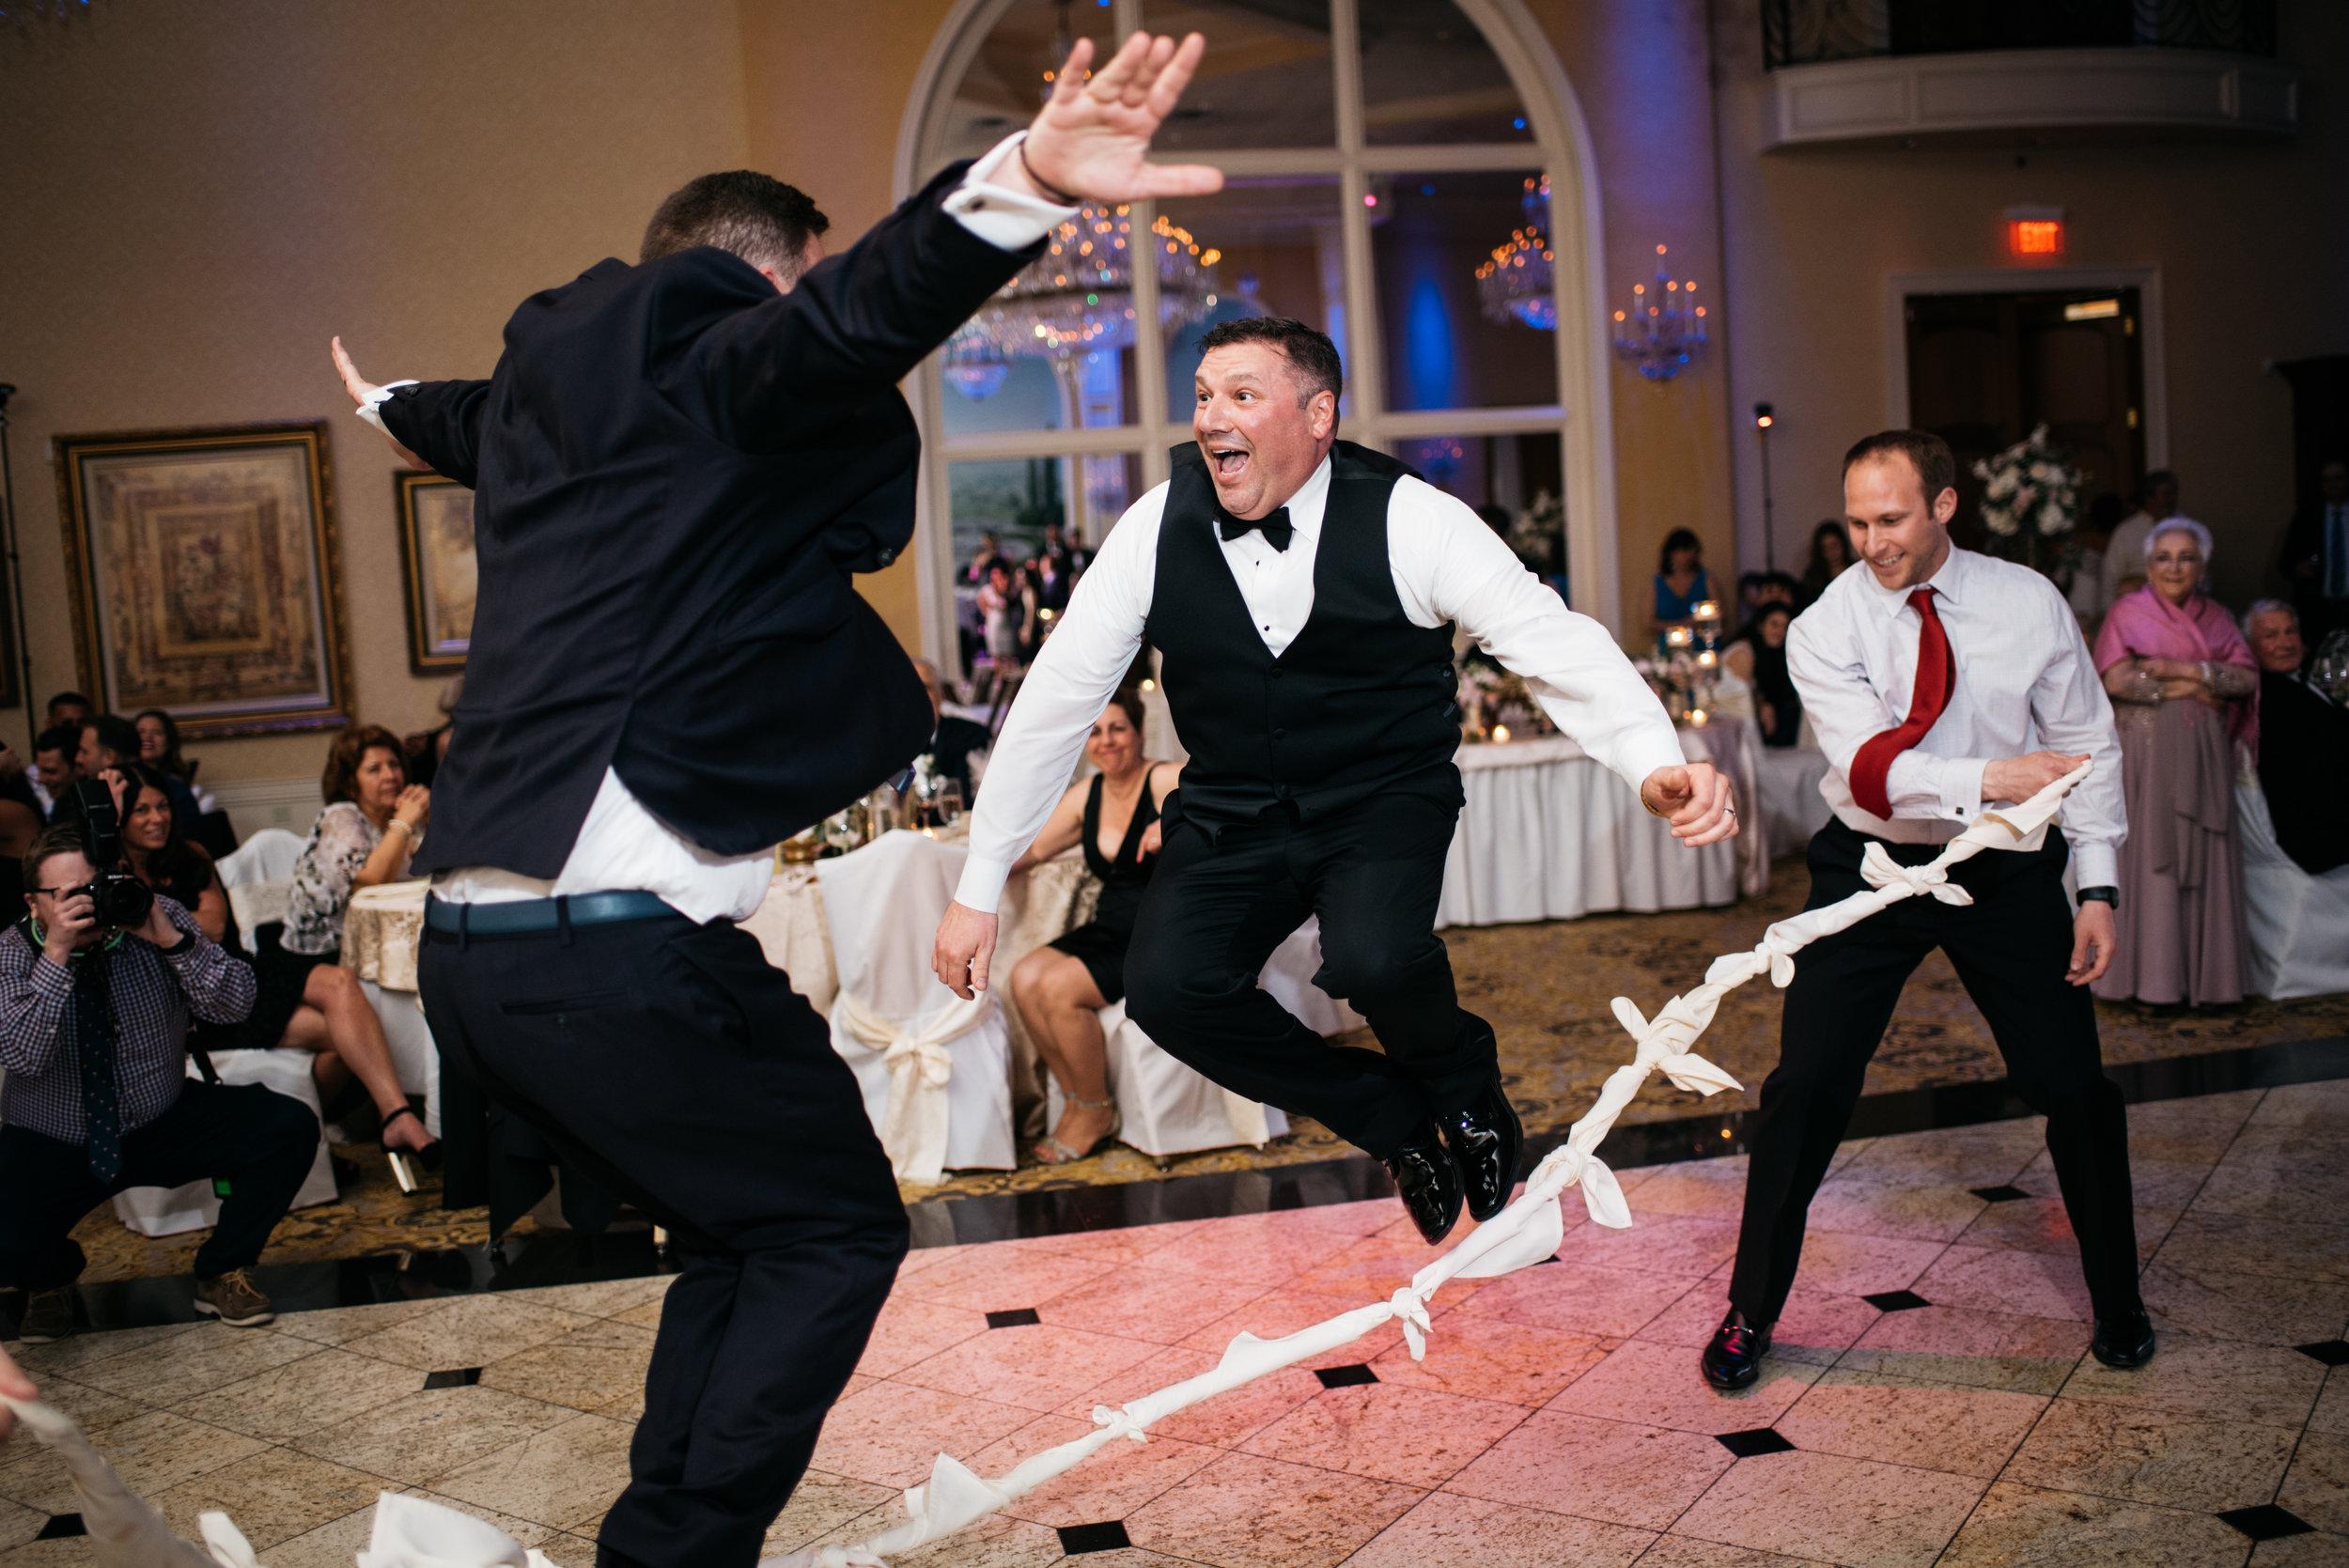 WeddingPhotos | NJPhotographer | Highlights-1-56.jpg